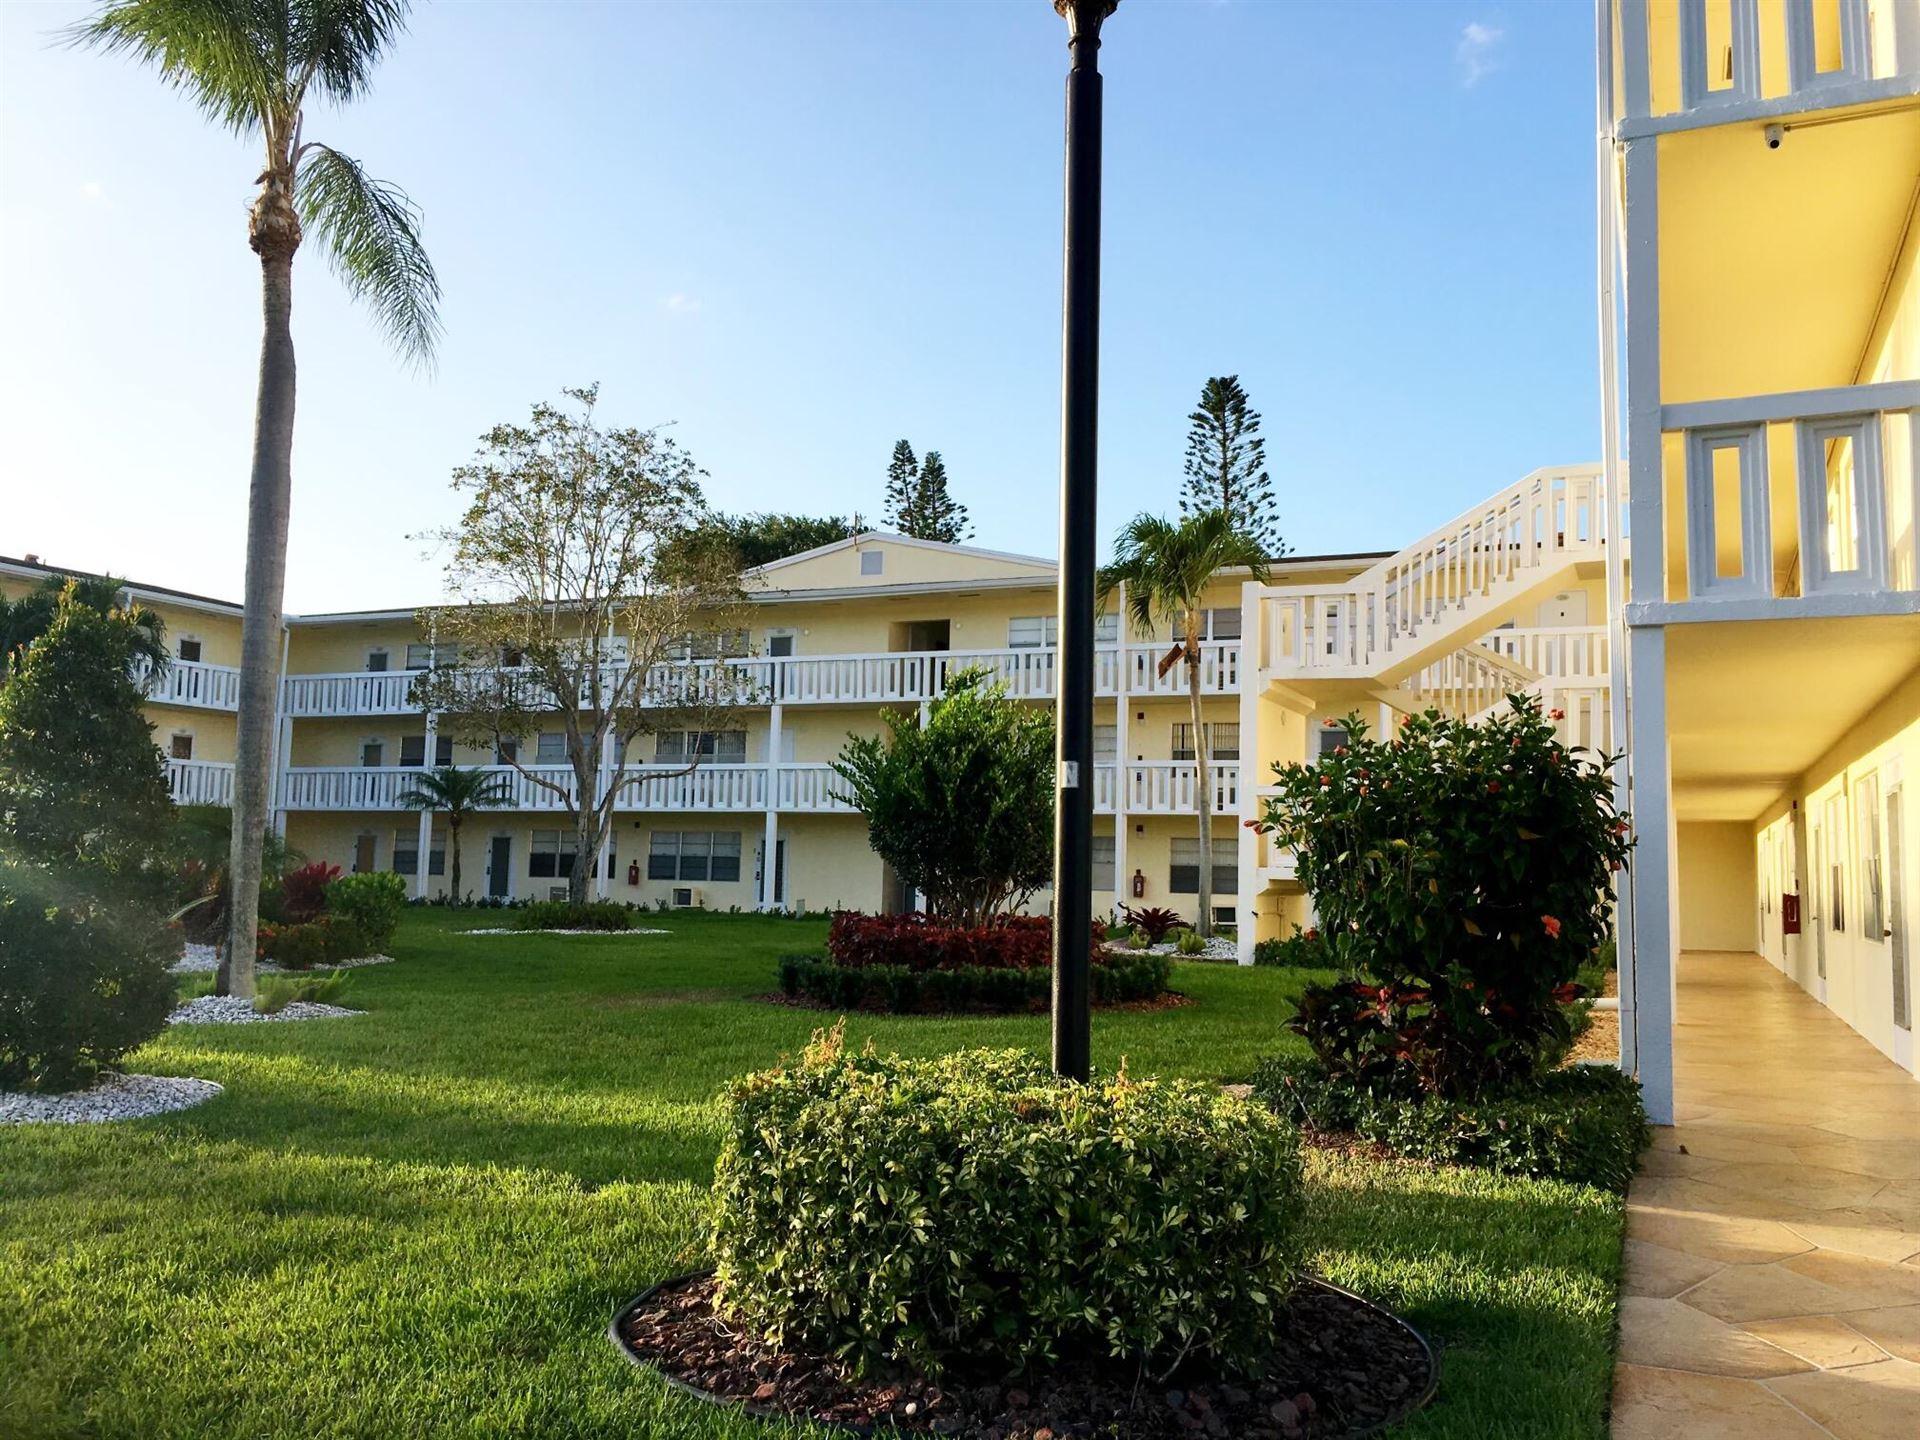 189 Dorset E, Boca Raton, FL 33434 - MLS#: RX-10709519